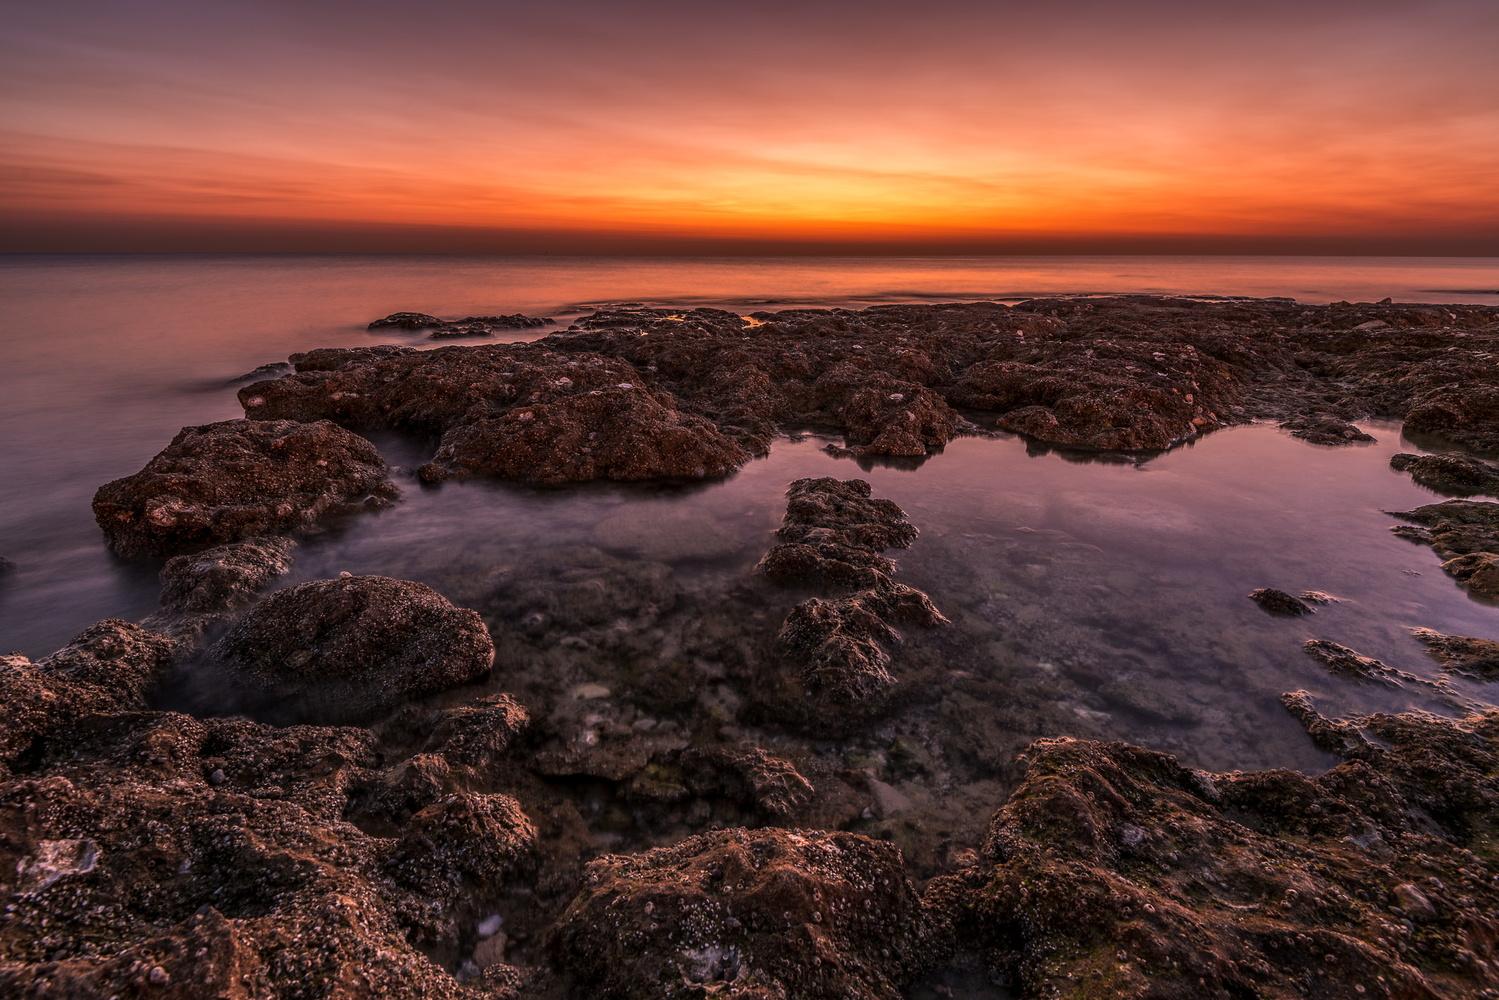 Golden golden hour by Muhammad Al-Qatam